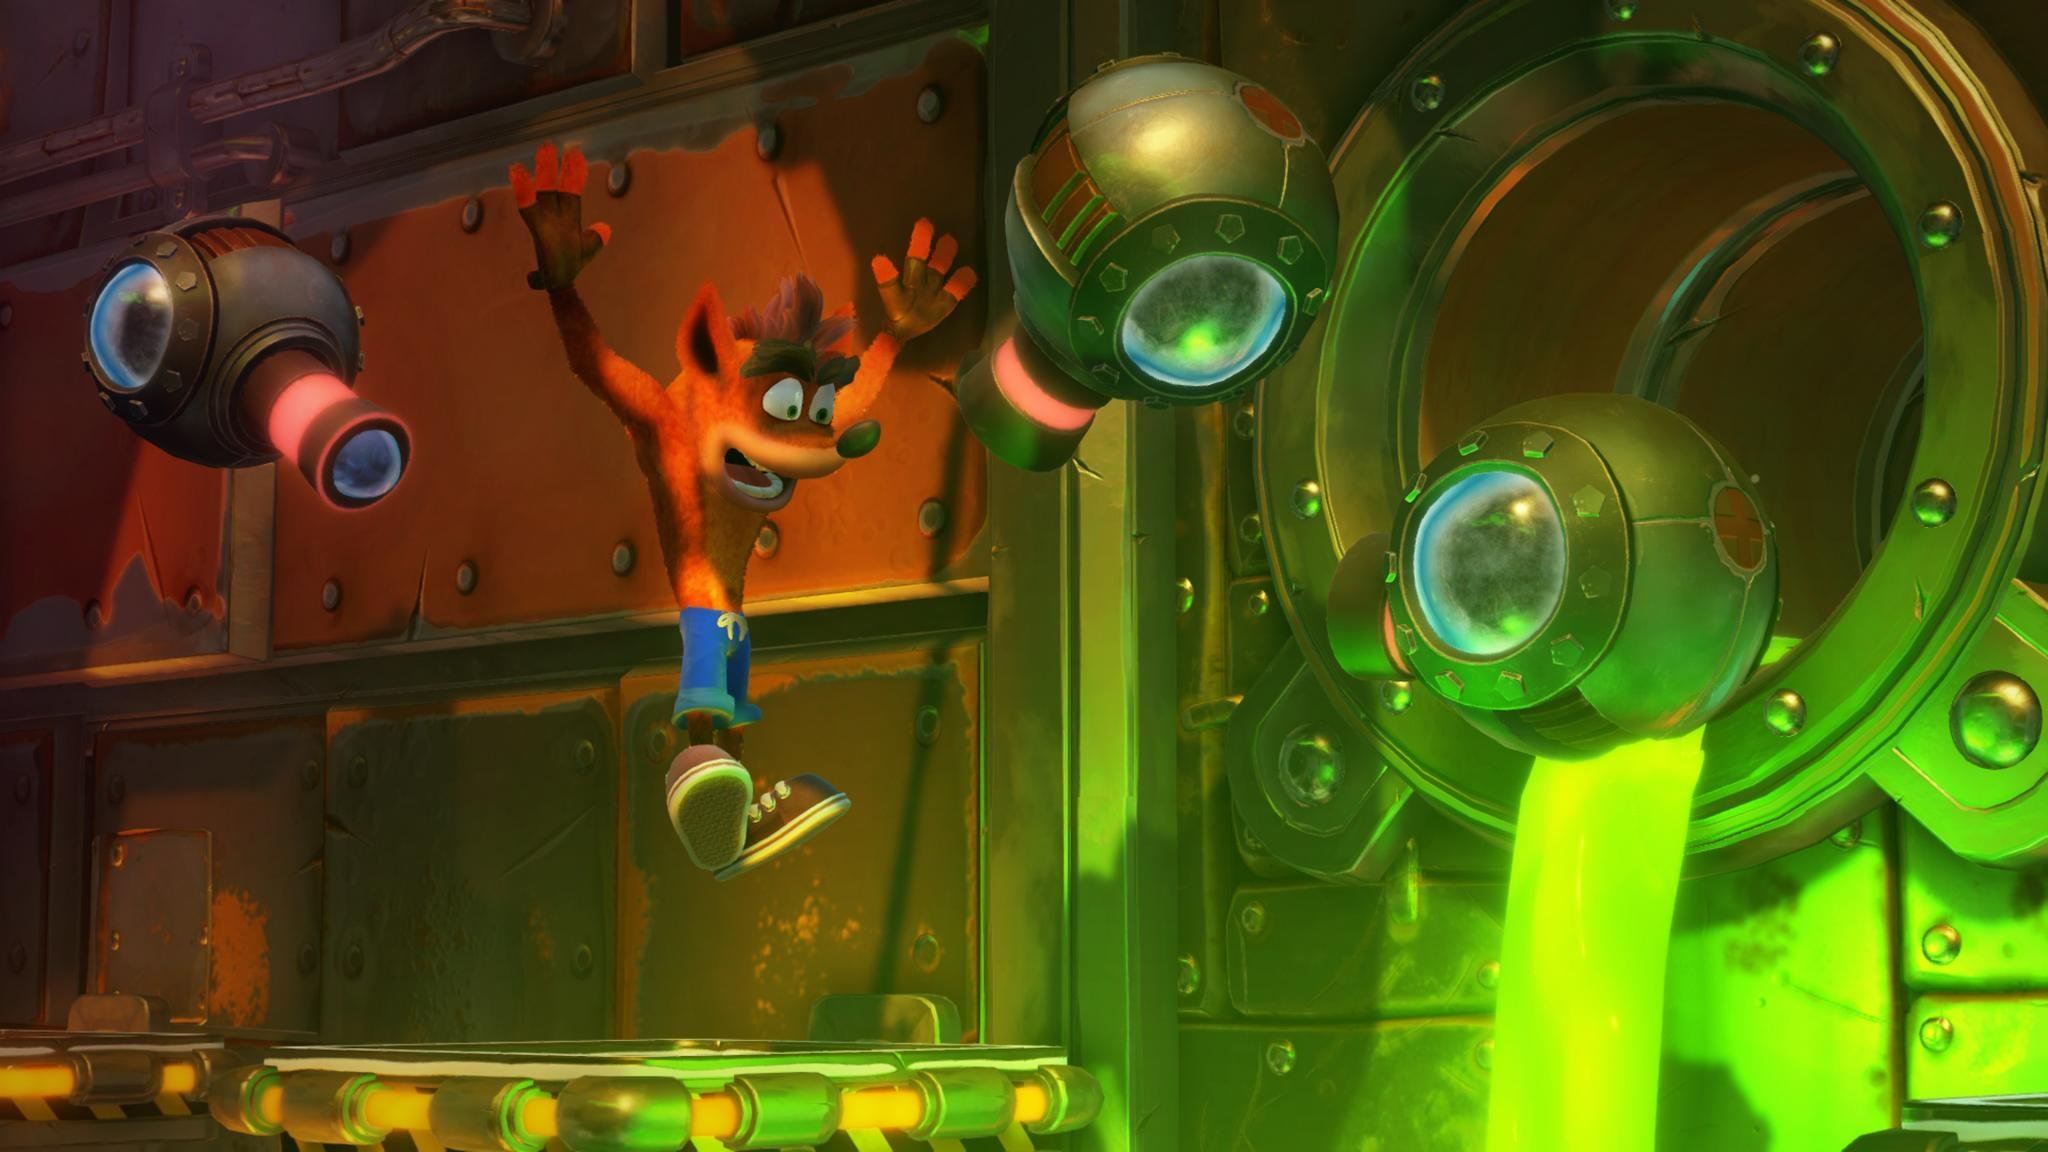 Crash Bandicoot 2 gameplay on PS4